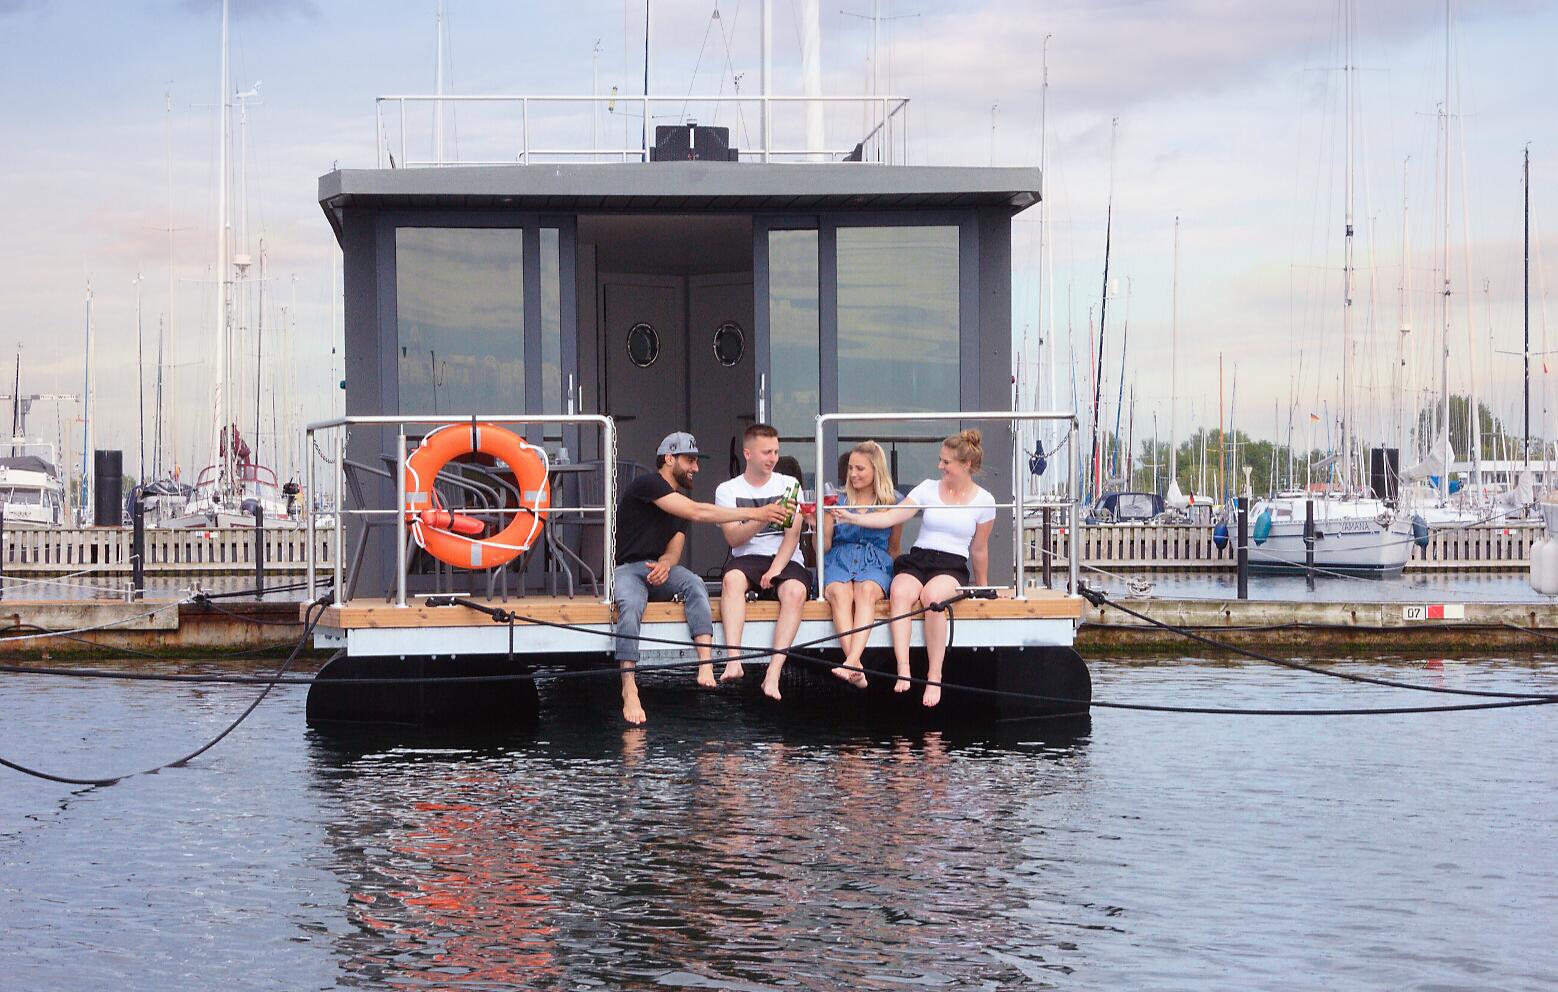 hausboot-uebernachtung-wendtorf-bg1